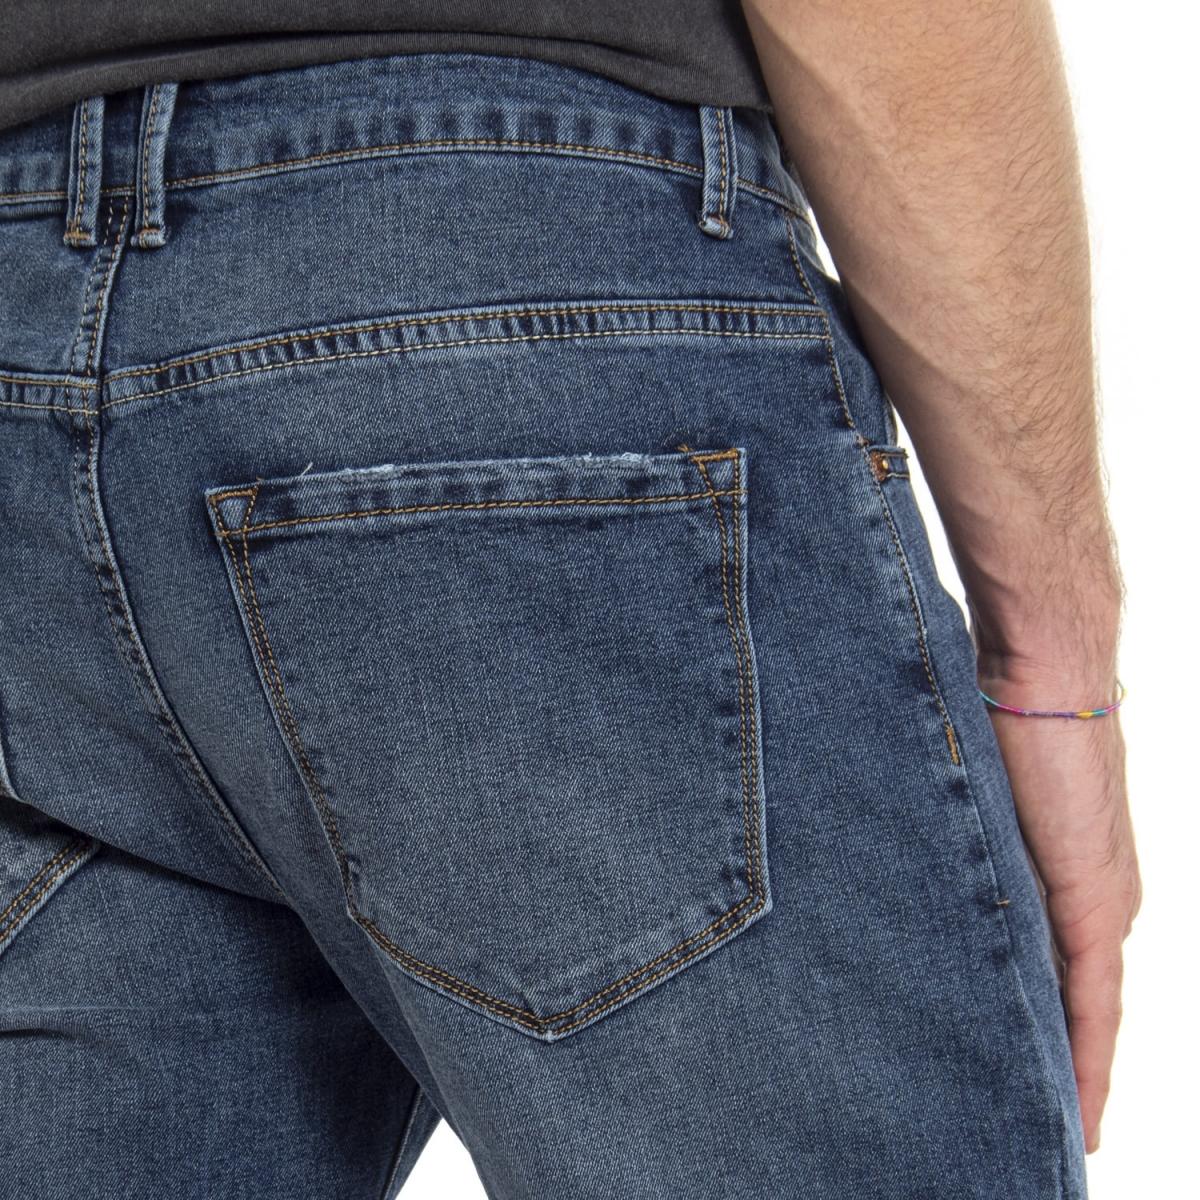 clothing Denim men Jeans ATM1088-2 LANDEK PARK Cafedelmar Shop